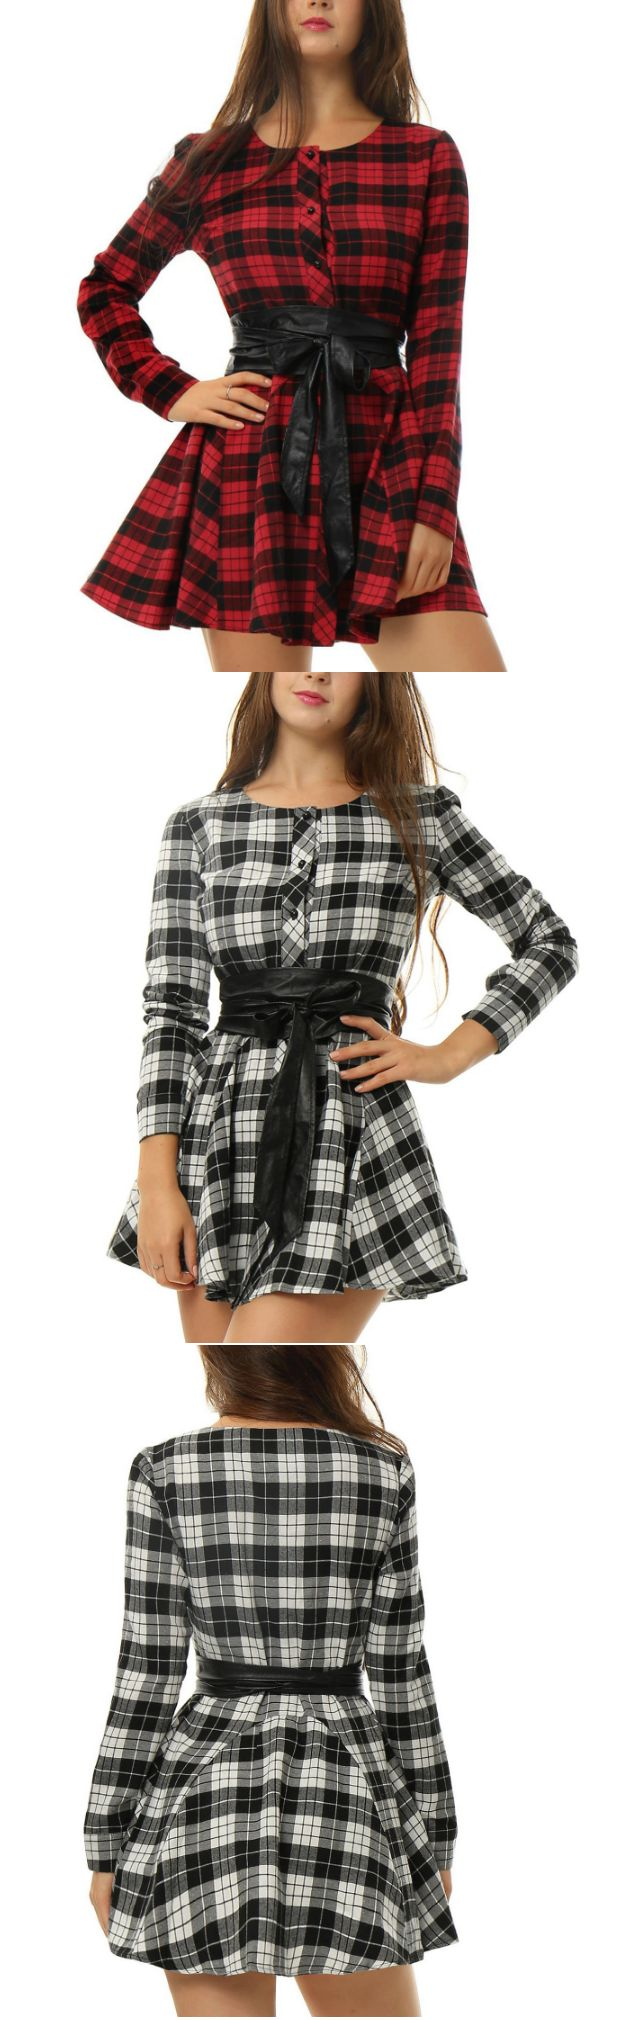 2016 Autumn Dresses Women Plaid Check Print Sprin Dress Wholesale Long Sleeve Shirt With Belt